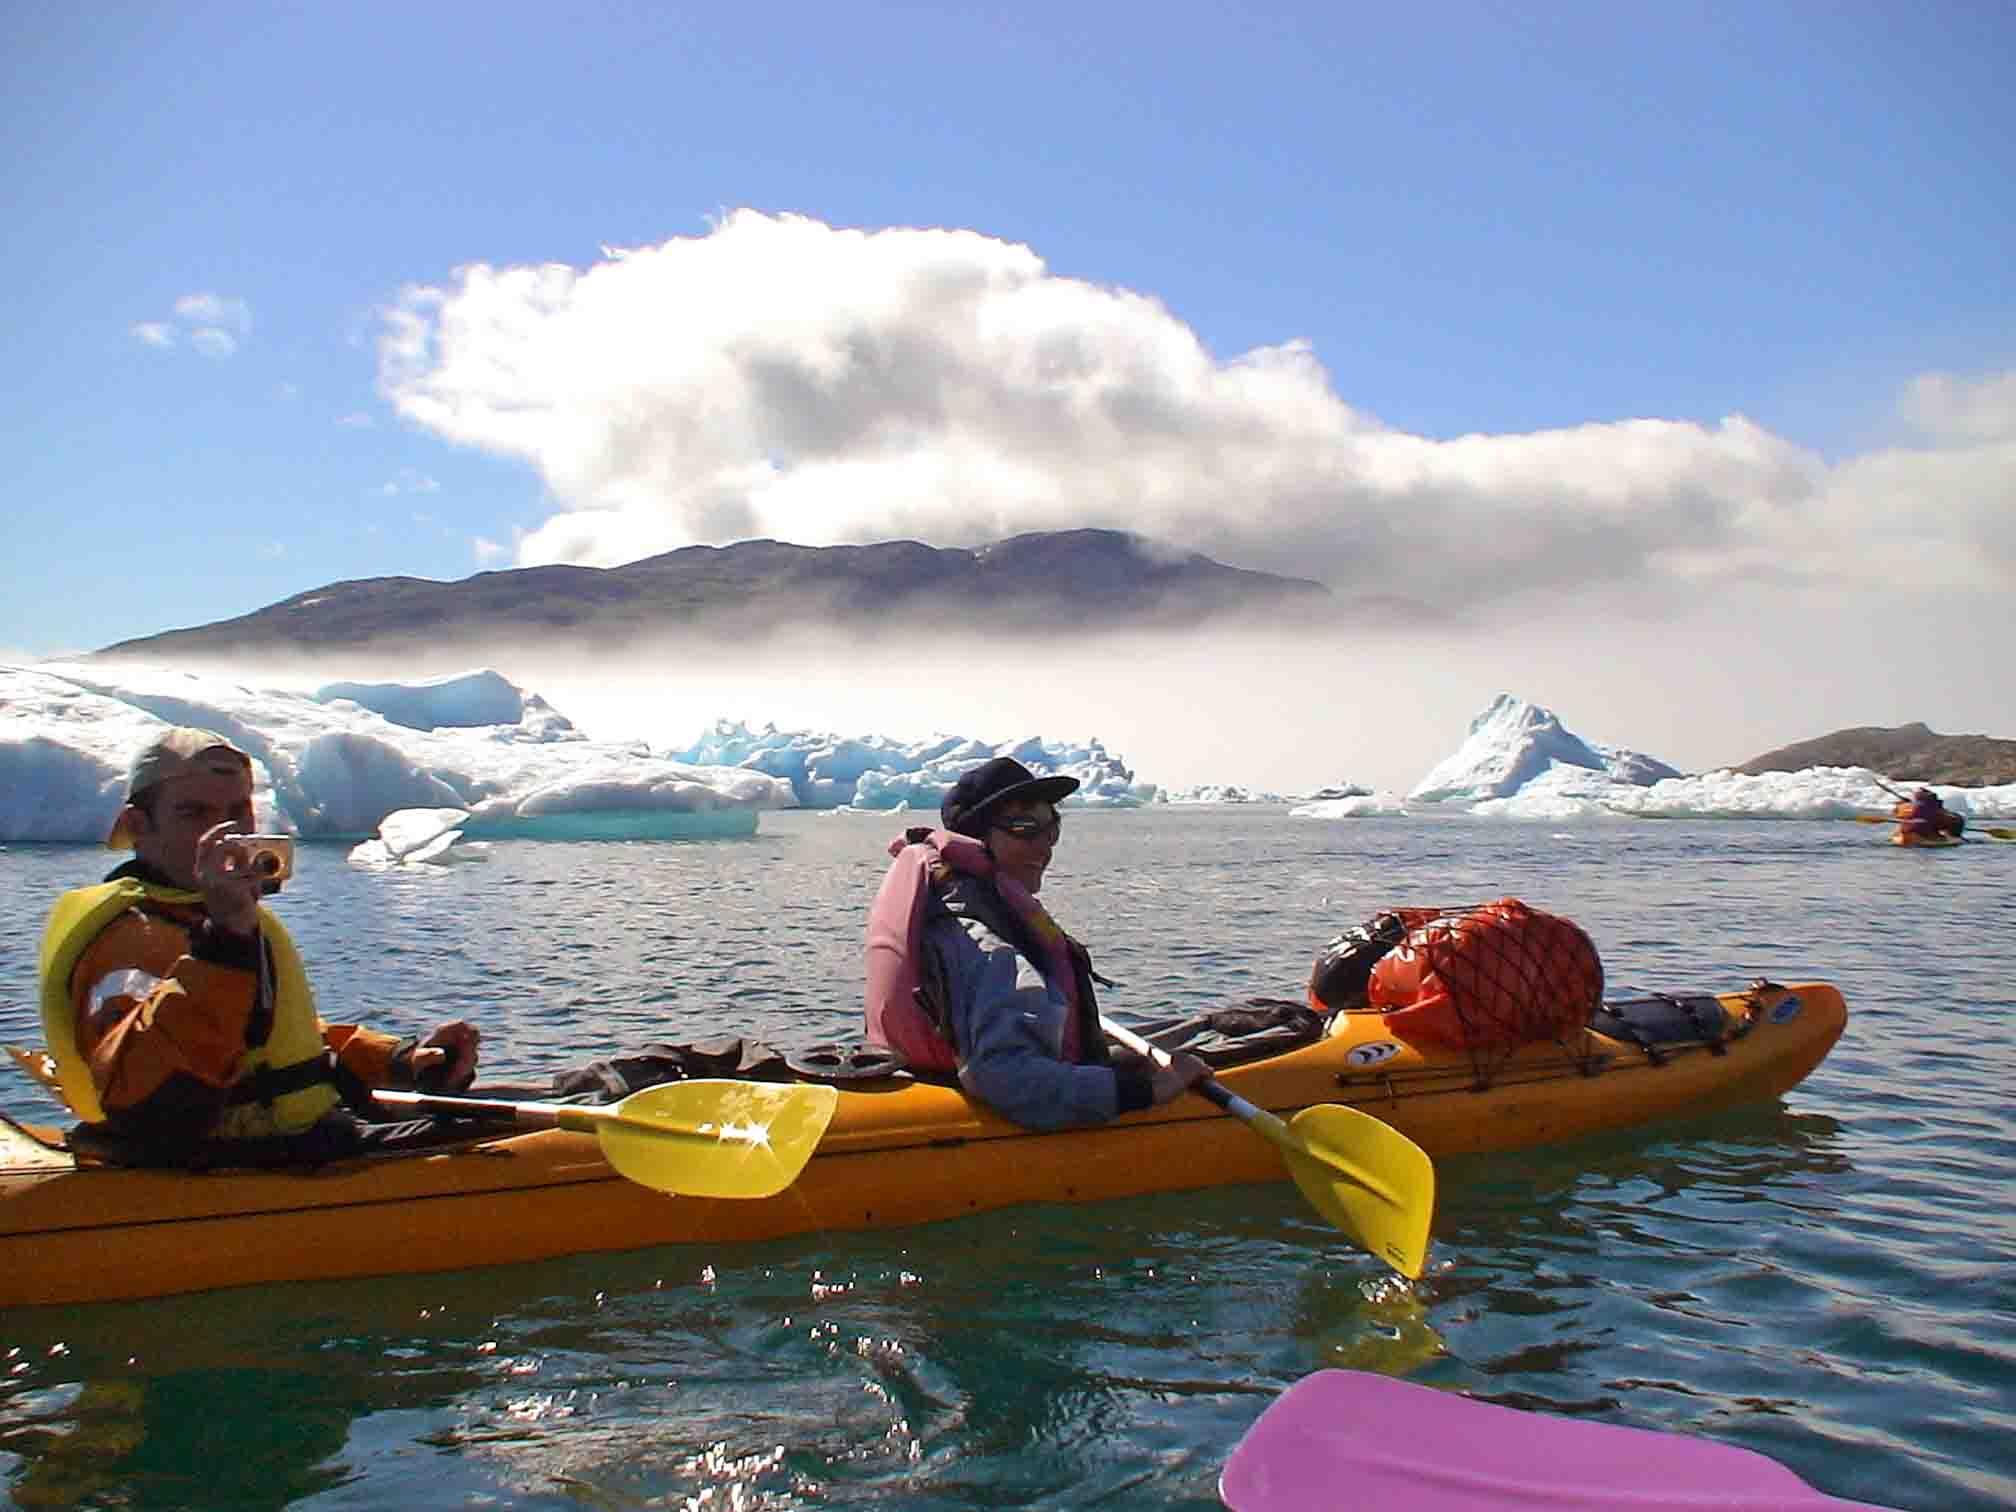 Kayak Groenlandia Ventajas del silencioso kayak... - Kayak ...